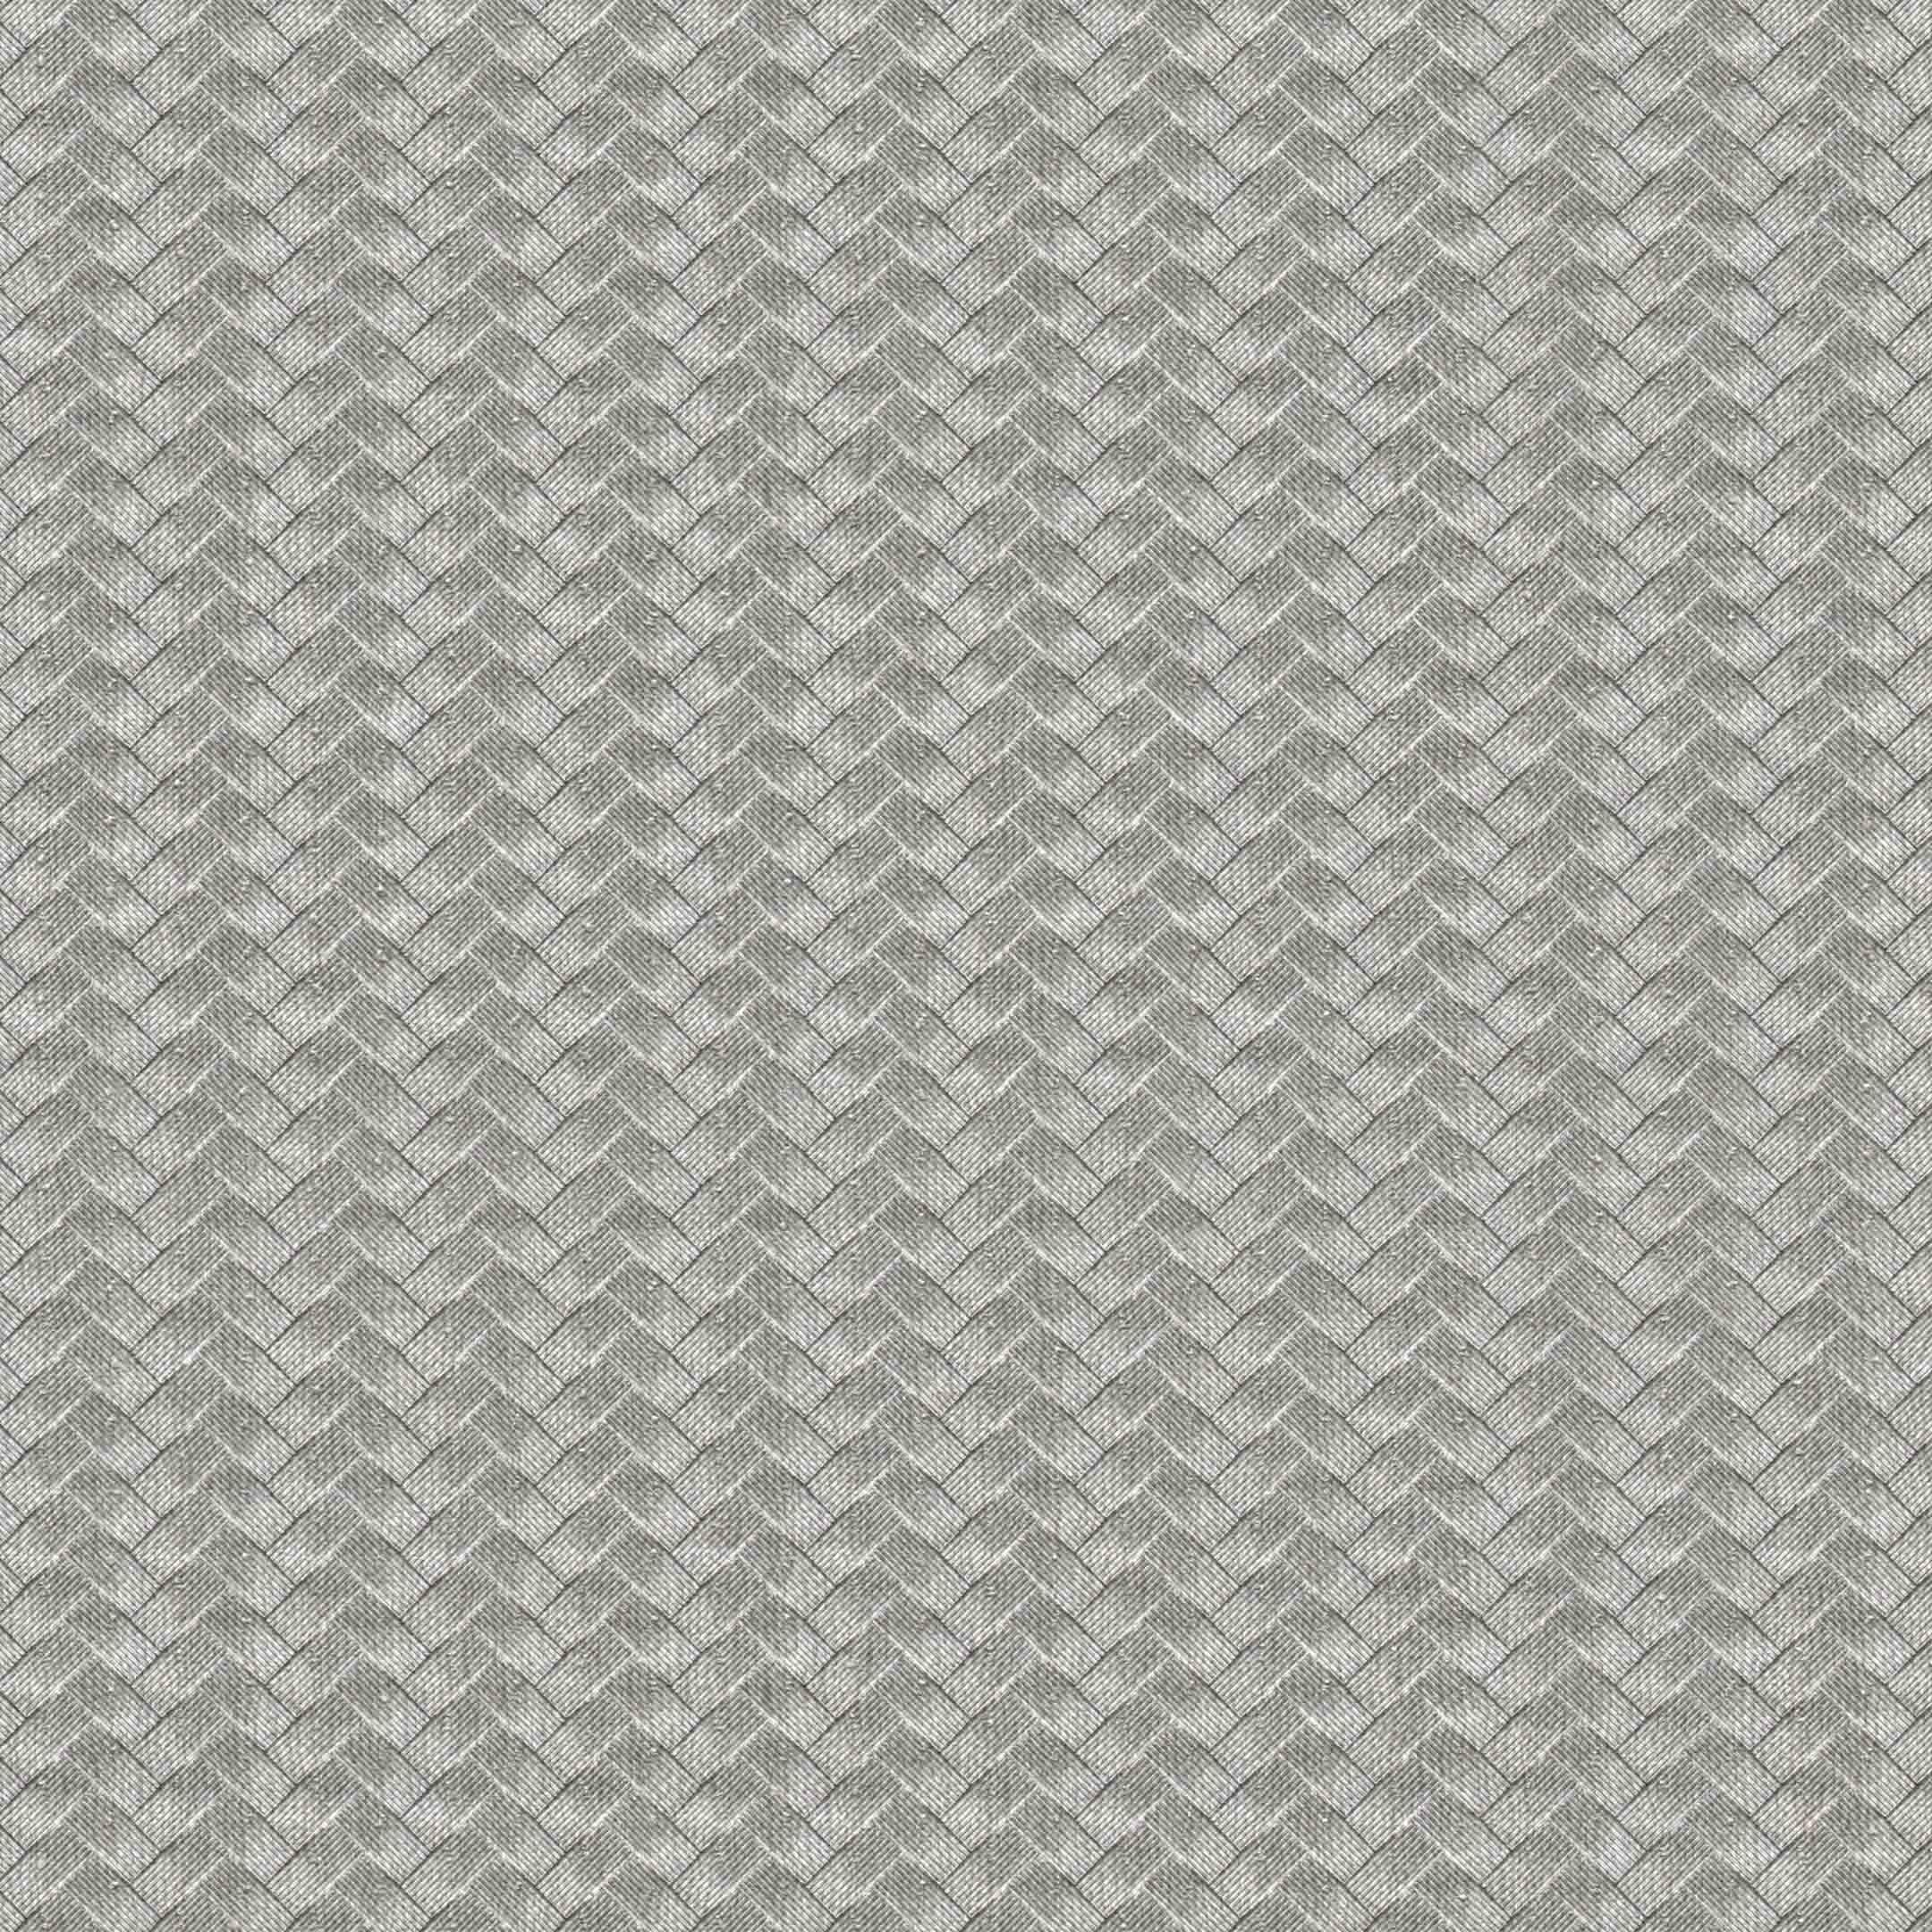 Обои виниловые на флизелиновой основе Zambaiti Lamborghini Z44853 (0,7х10,05 м) zambaiti parati обои zambaiti parati stella 7210r